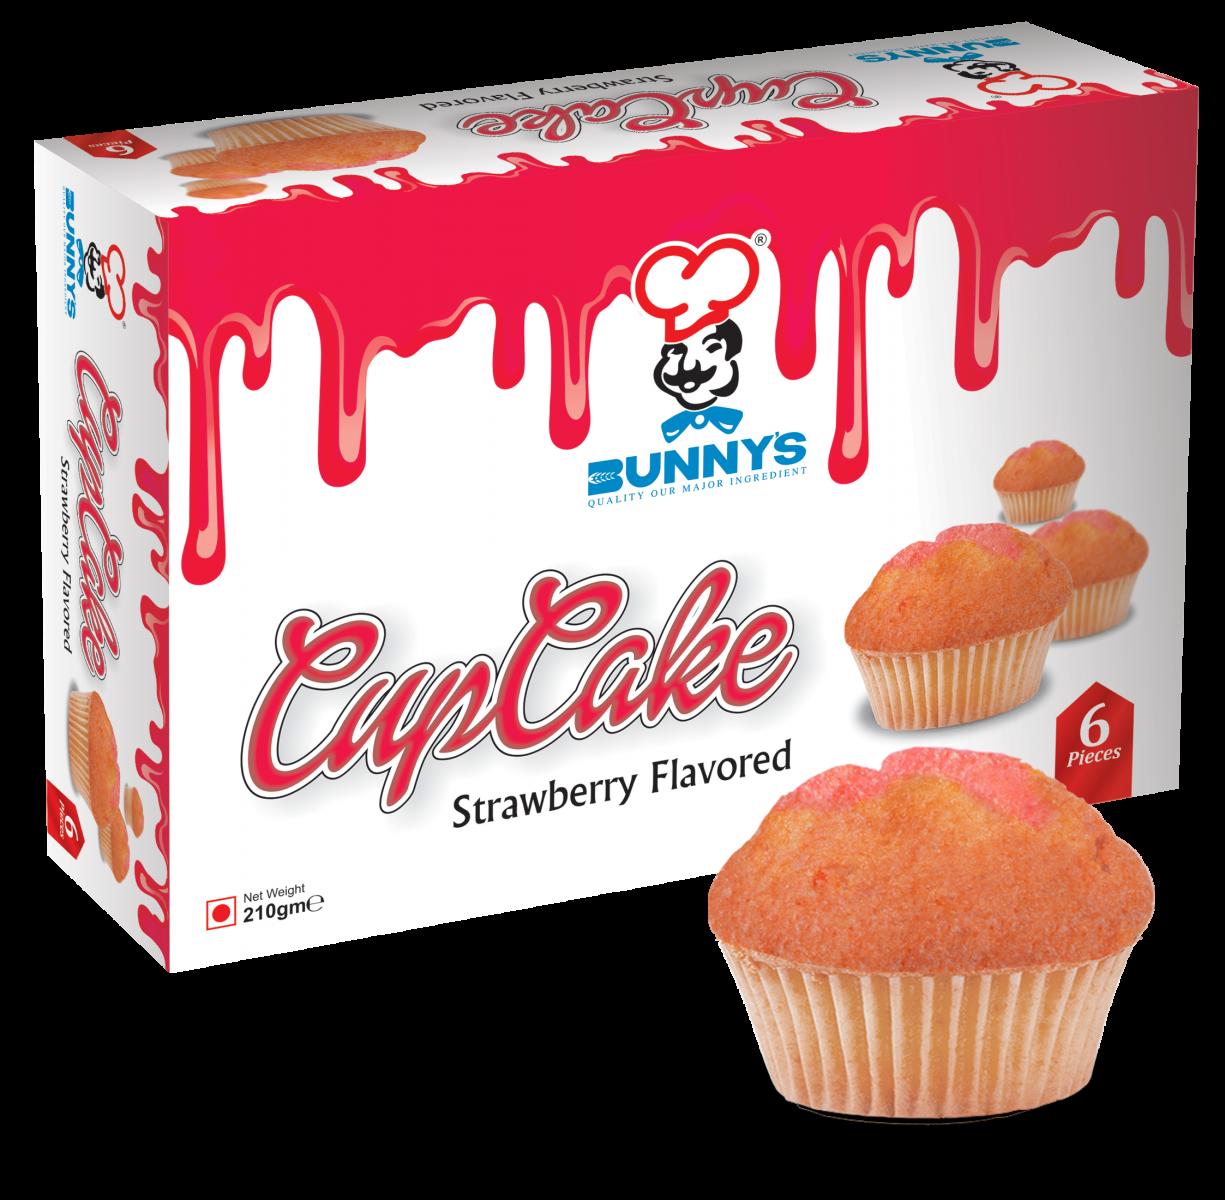 bunnys-strawberry-cupcake